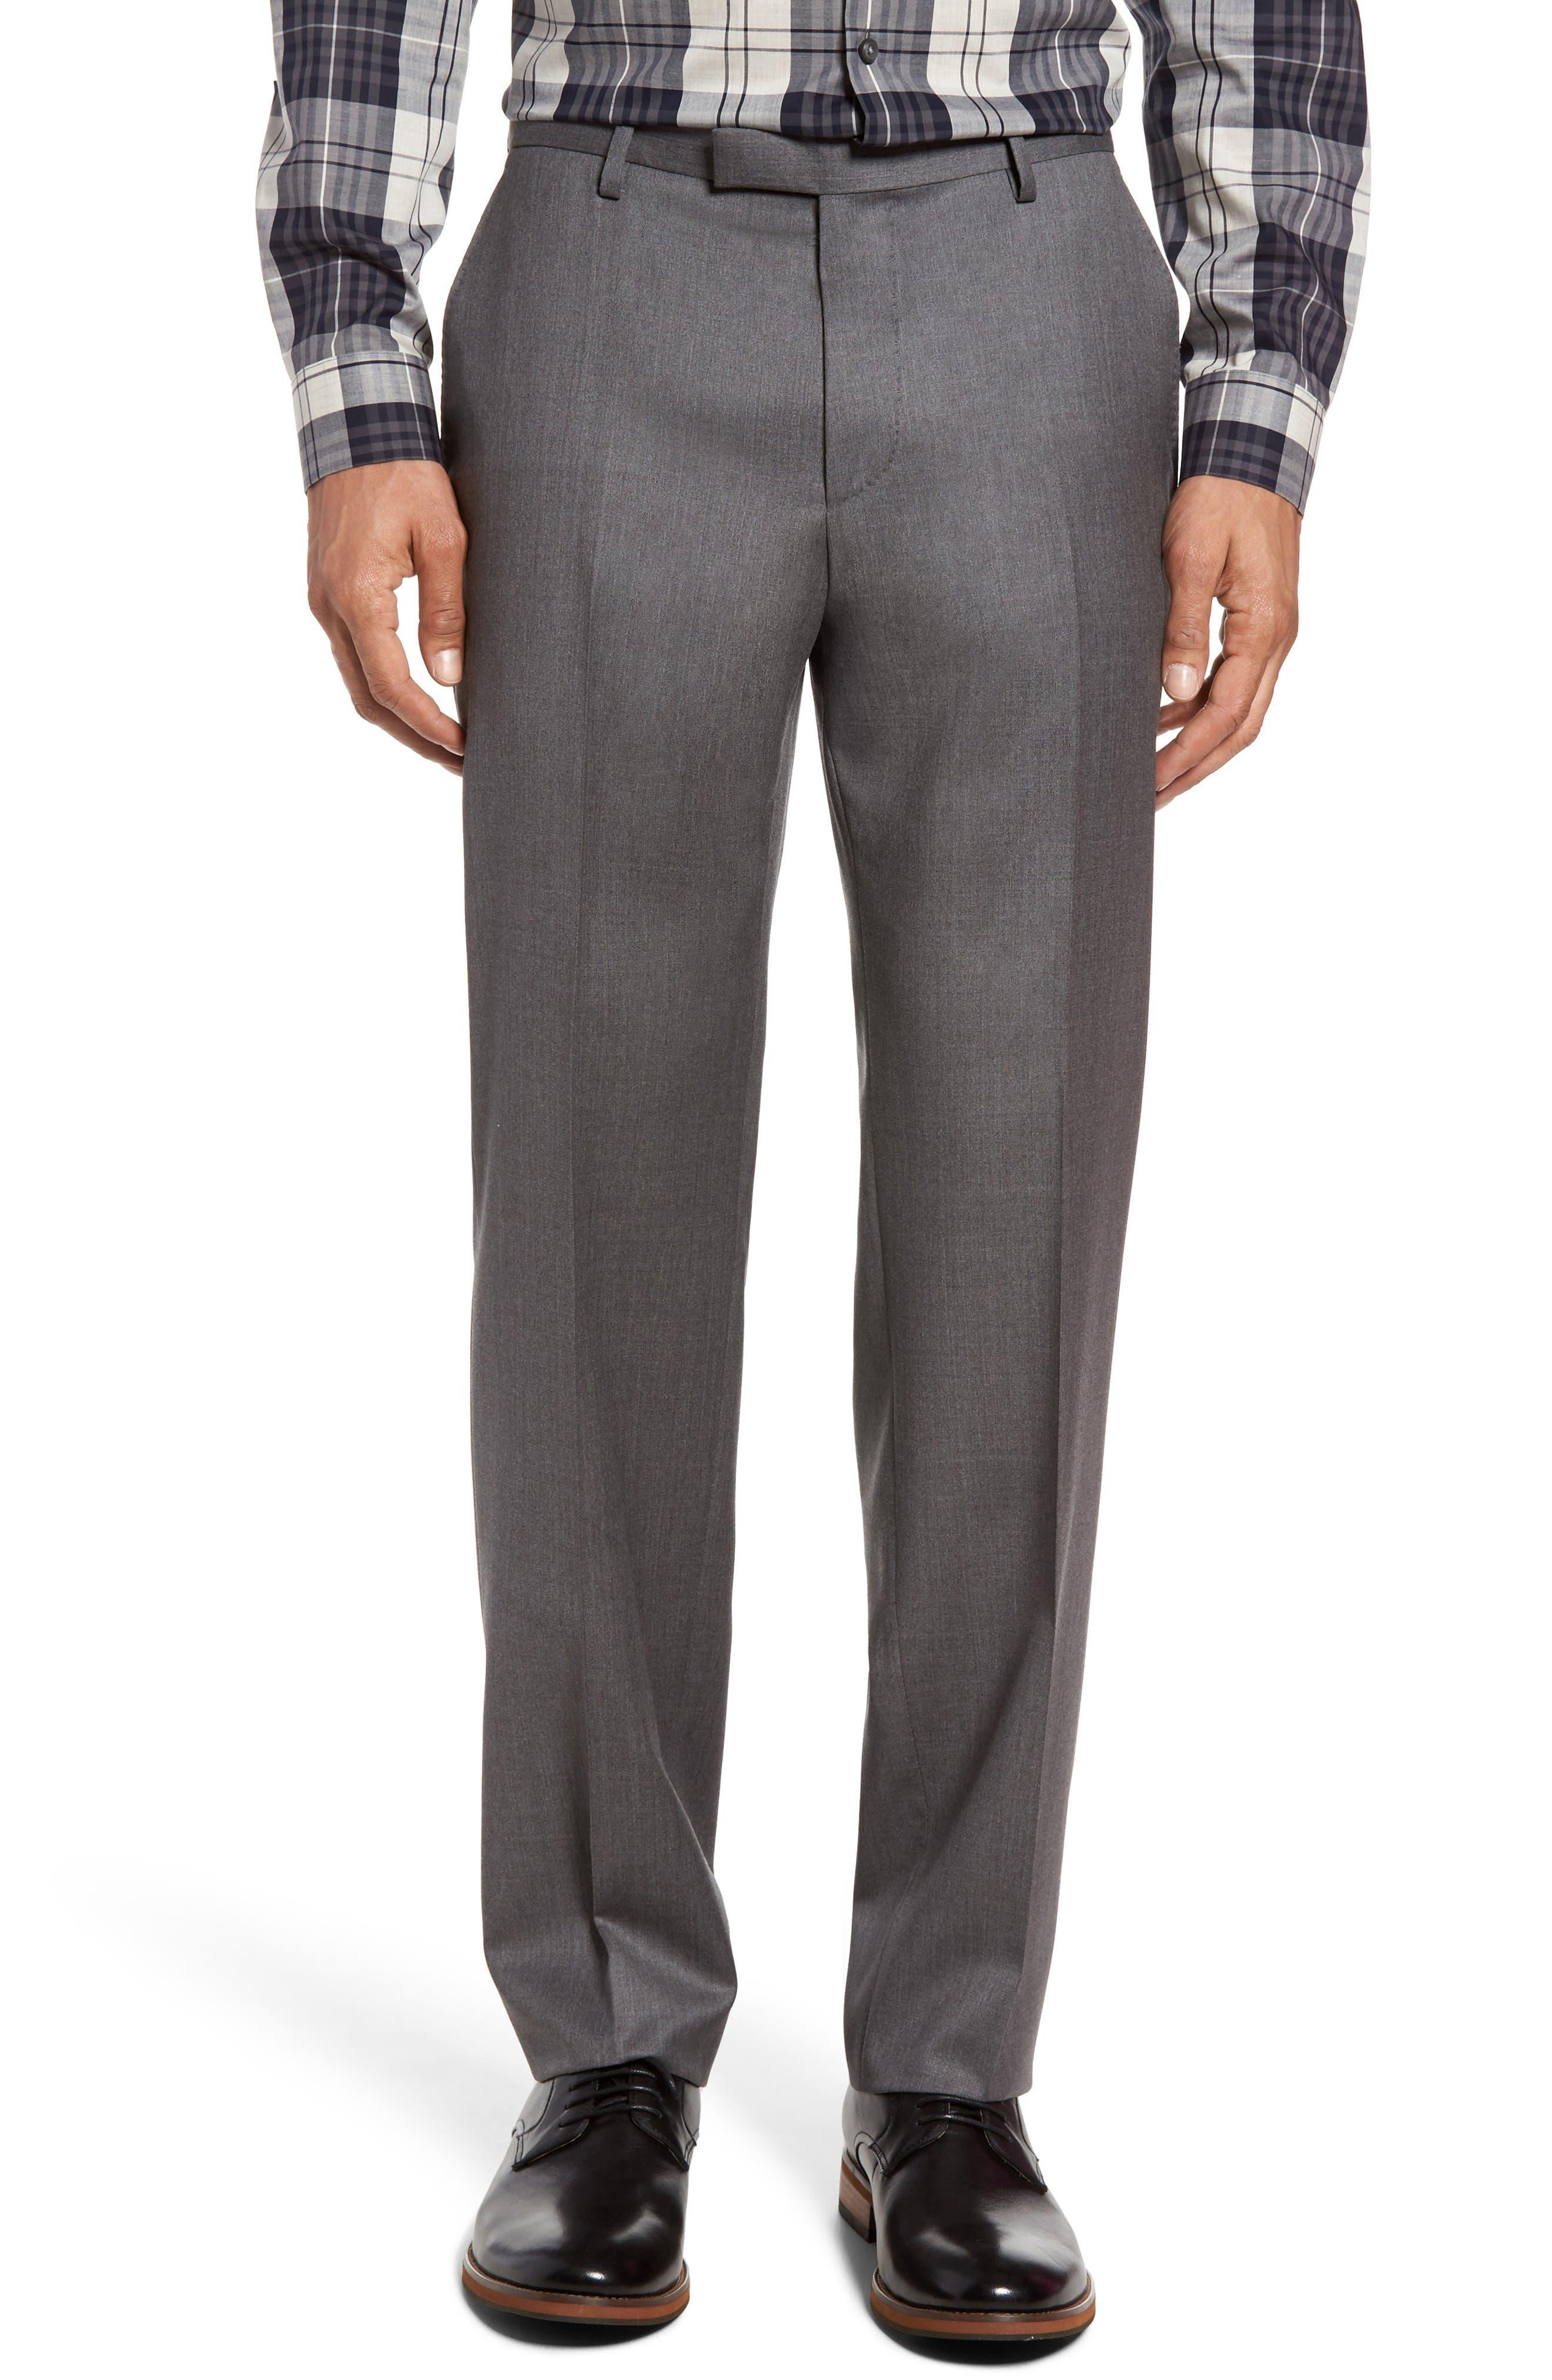 Leenon Flat Front Regular Fit Solid Wool Trousers,                         Main,                         color, Medium Grey